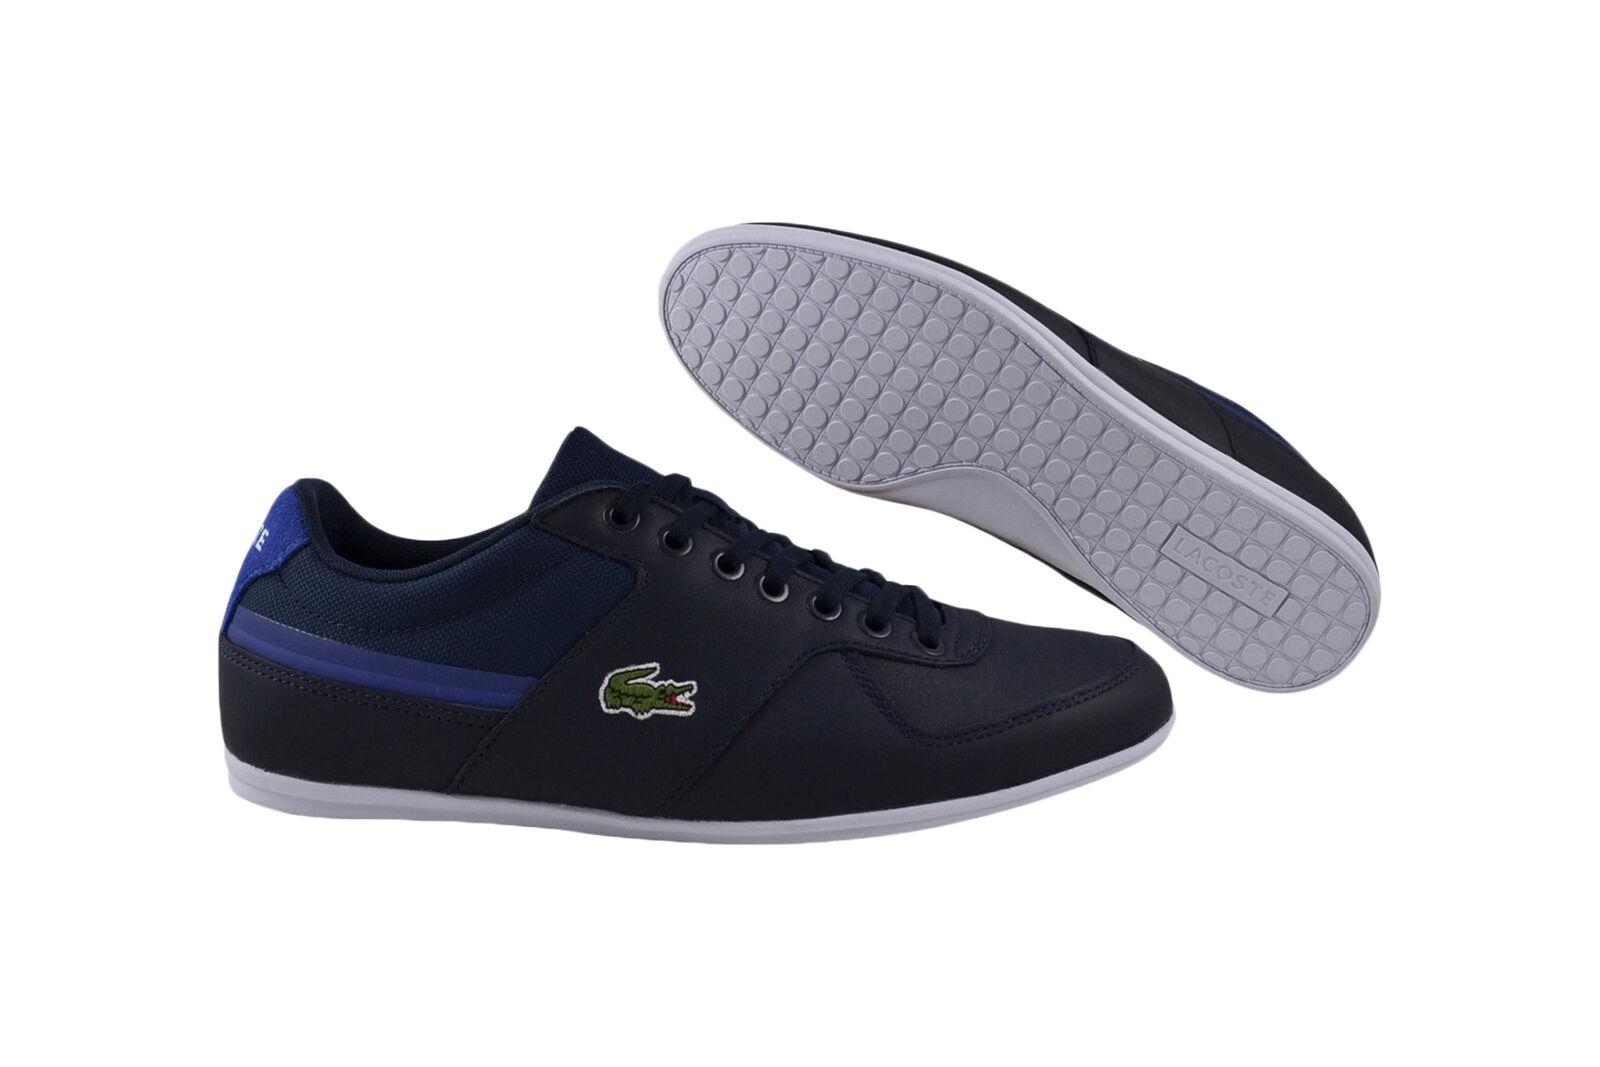 Lacoste Taloire Sport 116 1 SPM navy Premium Turnschuhe Schuhe blau